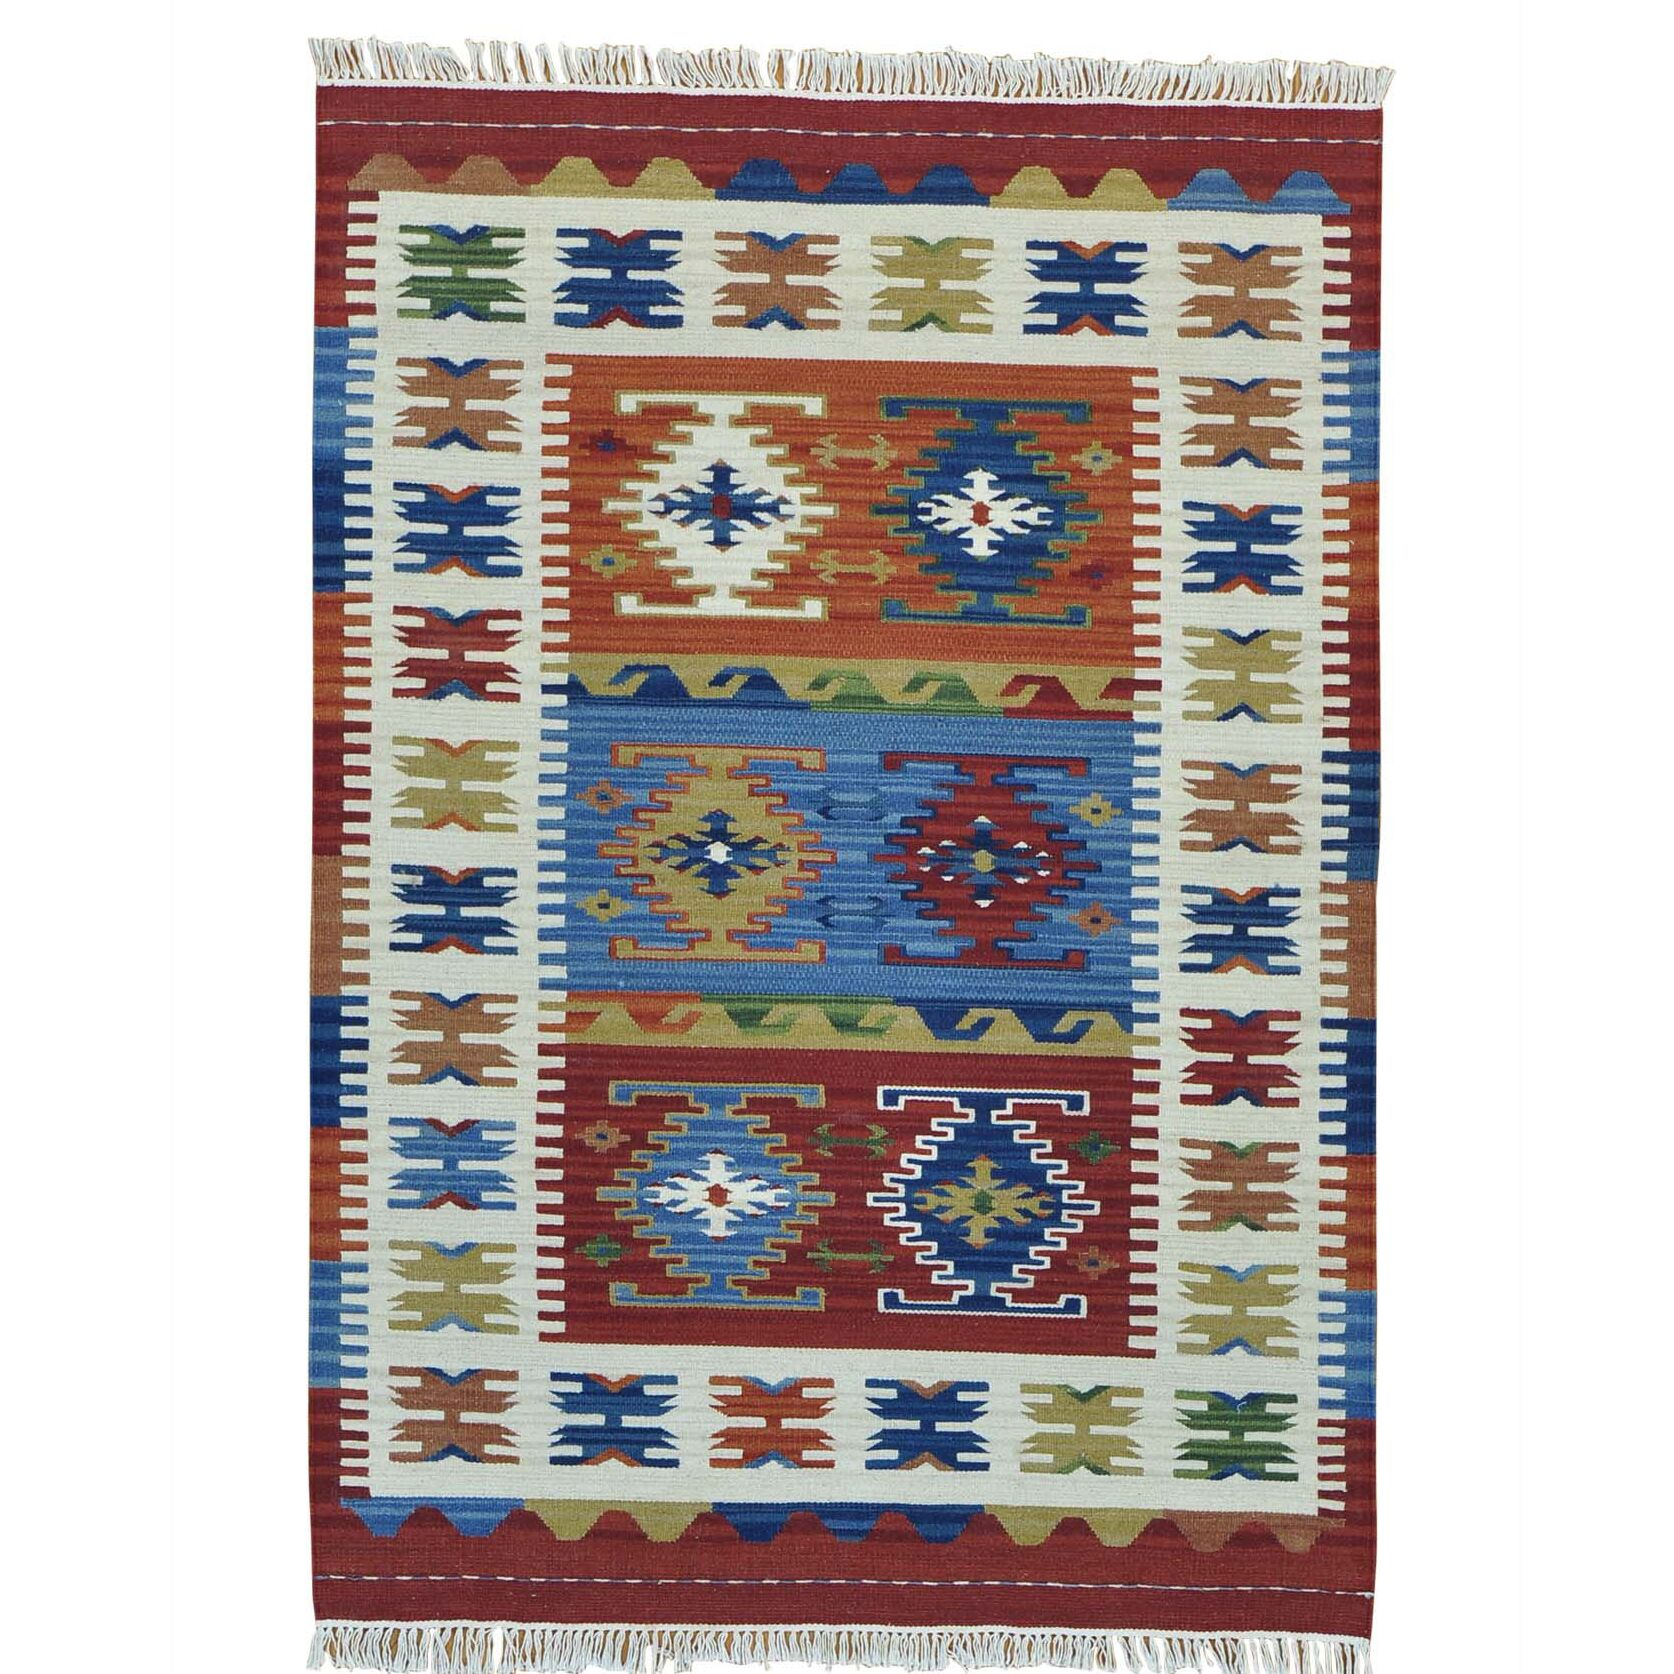 Reversible Flat Weave Anatolian Kilim Oriental Hand-Knotted Maroon/Cream Area Rug